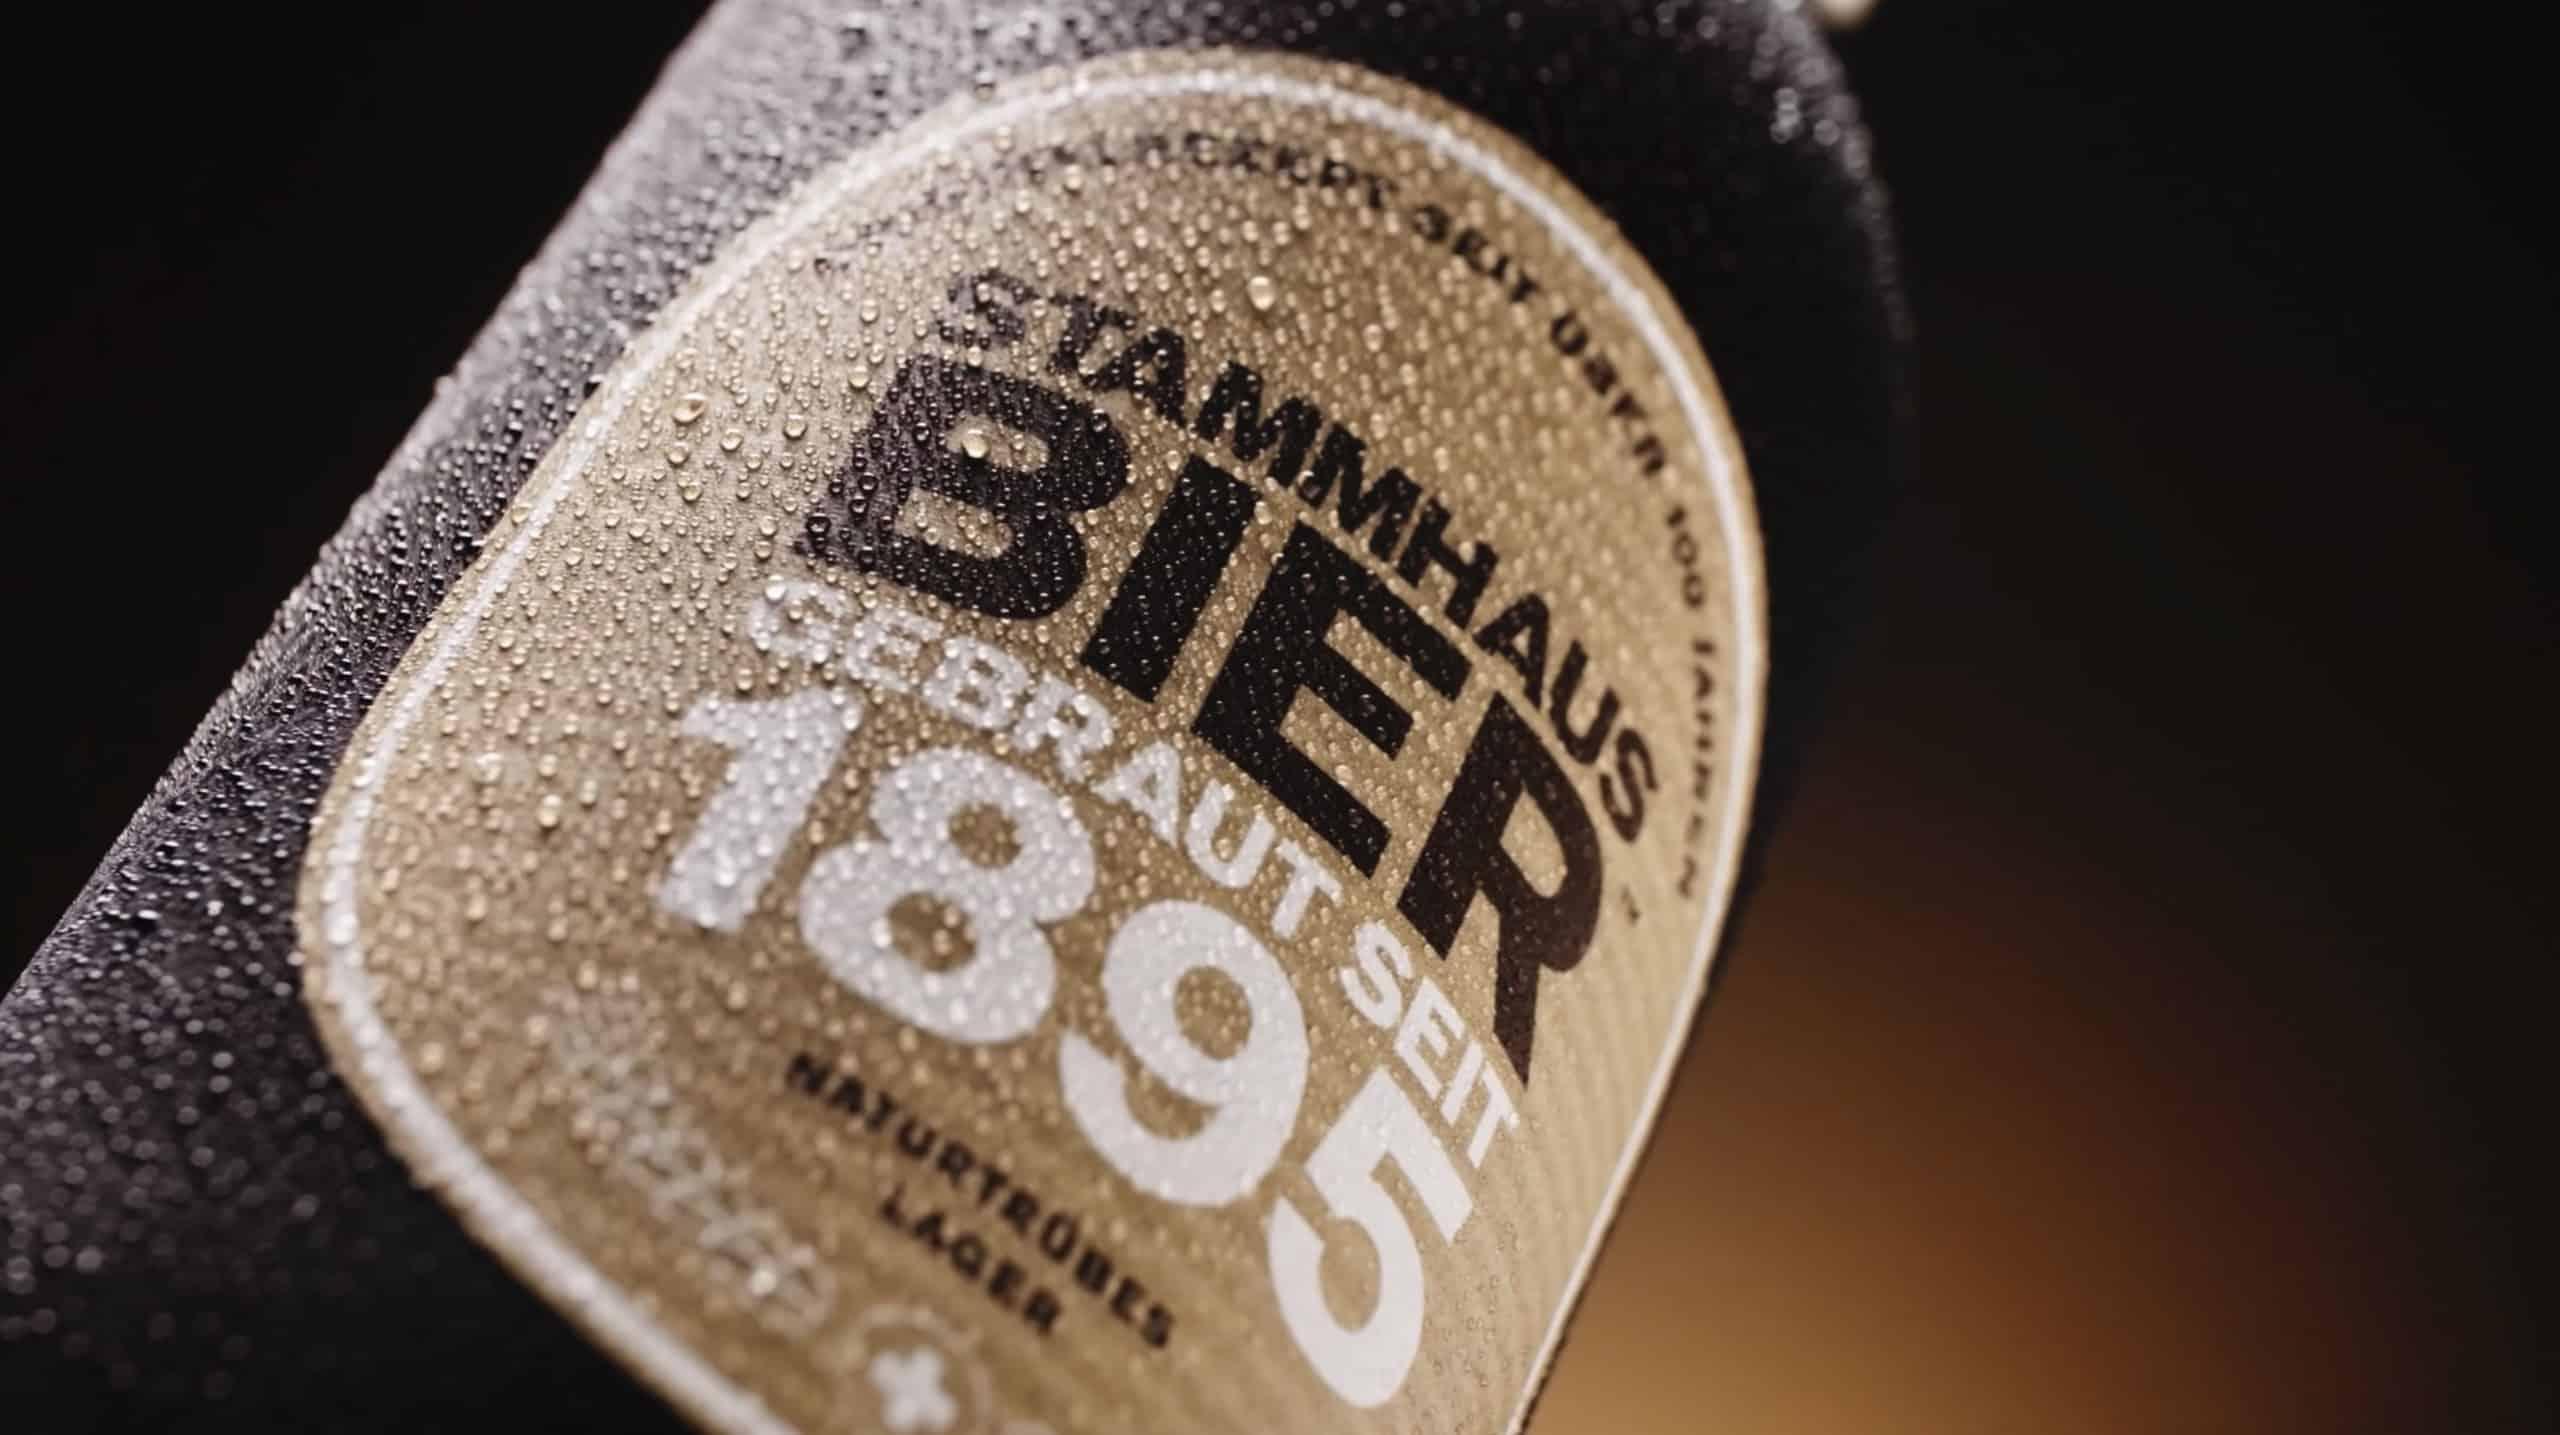 Stammhaus-Bier-Thumbnail-scaled